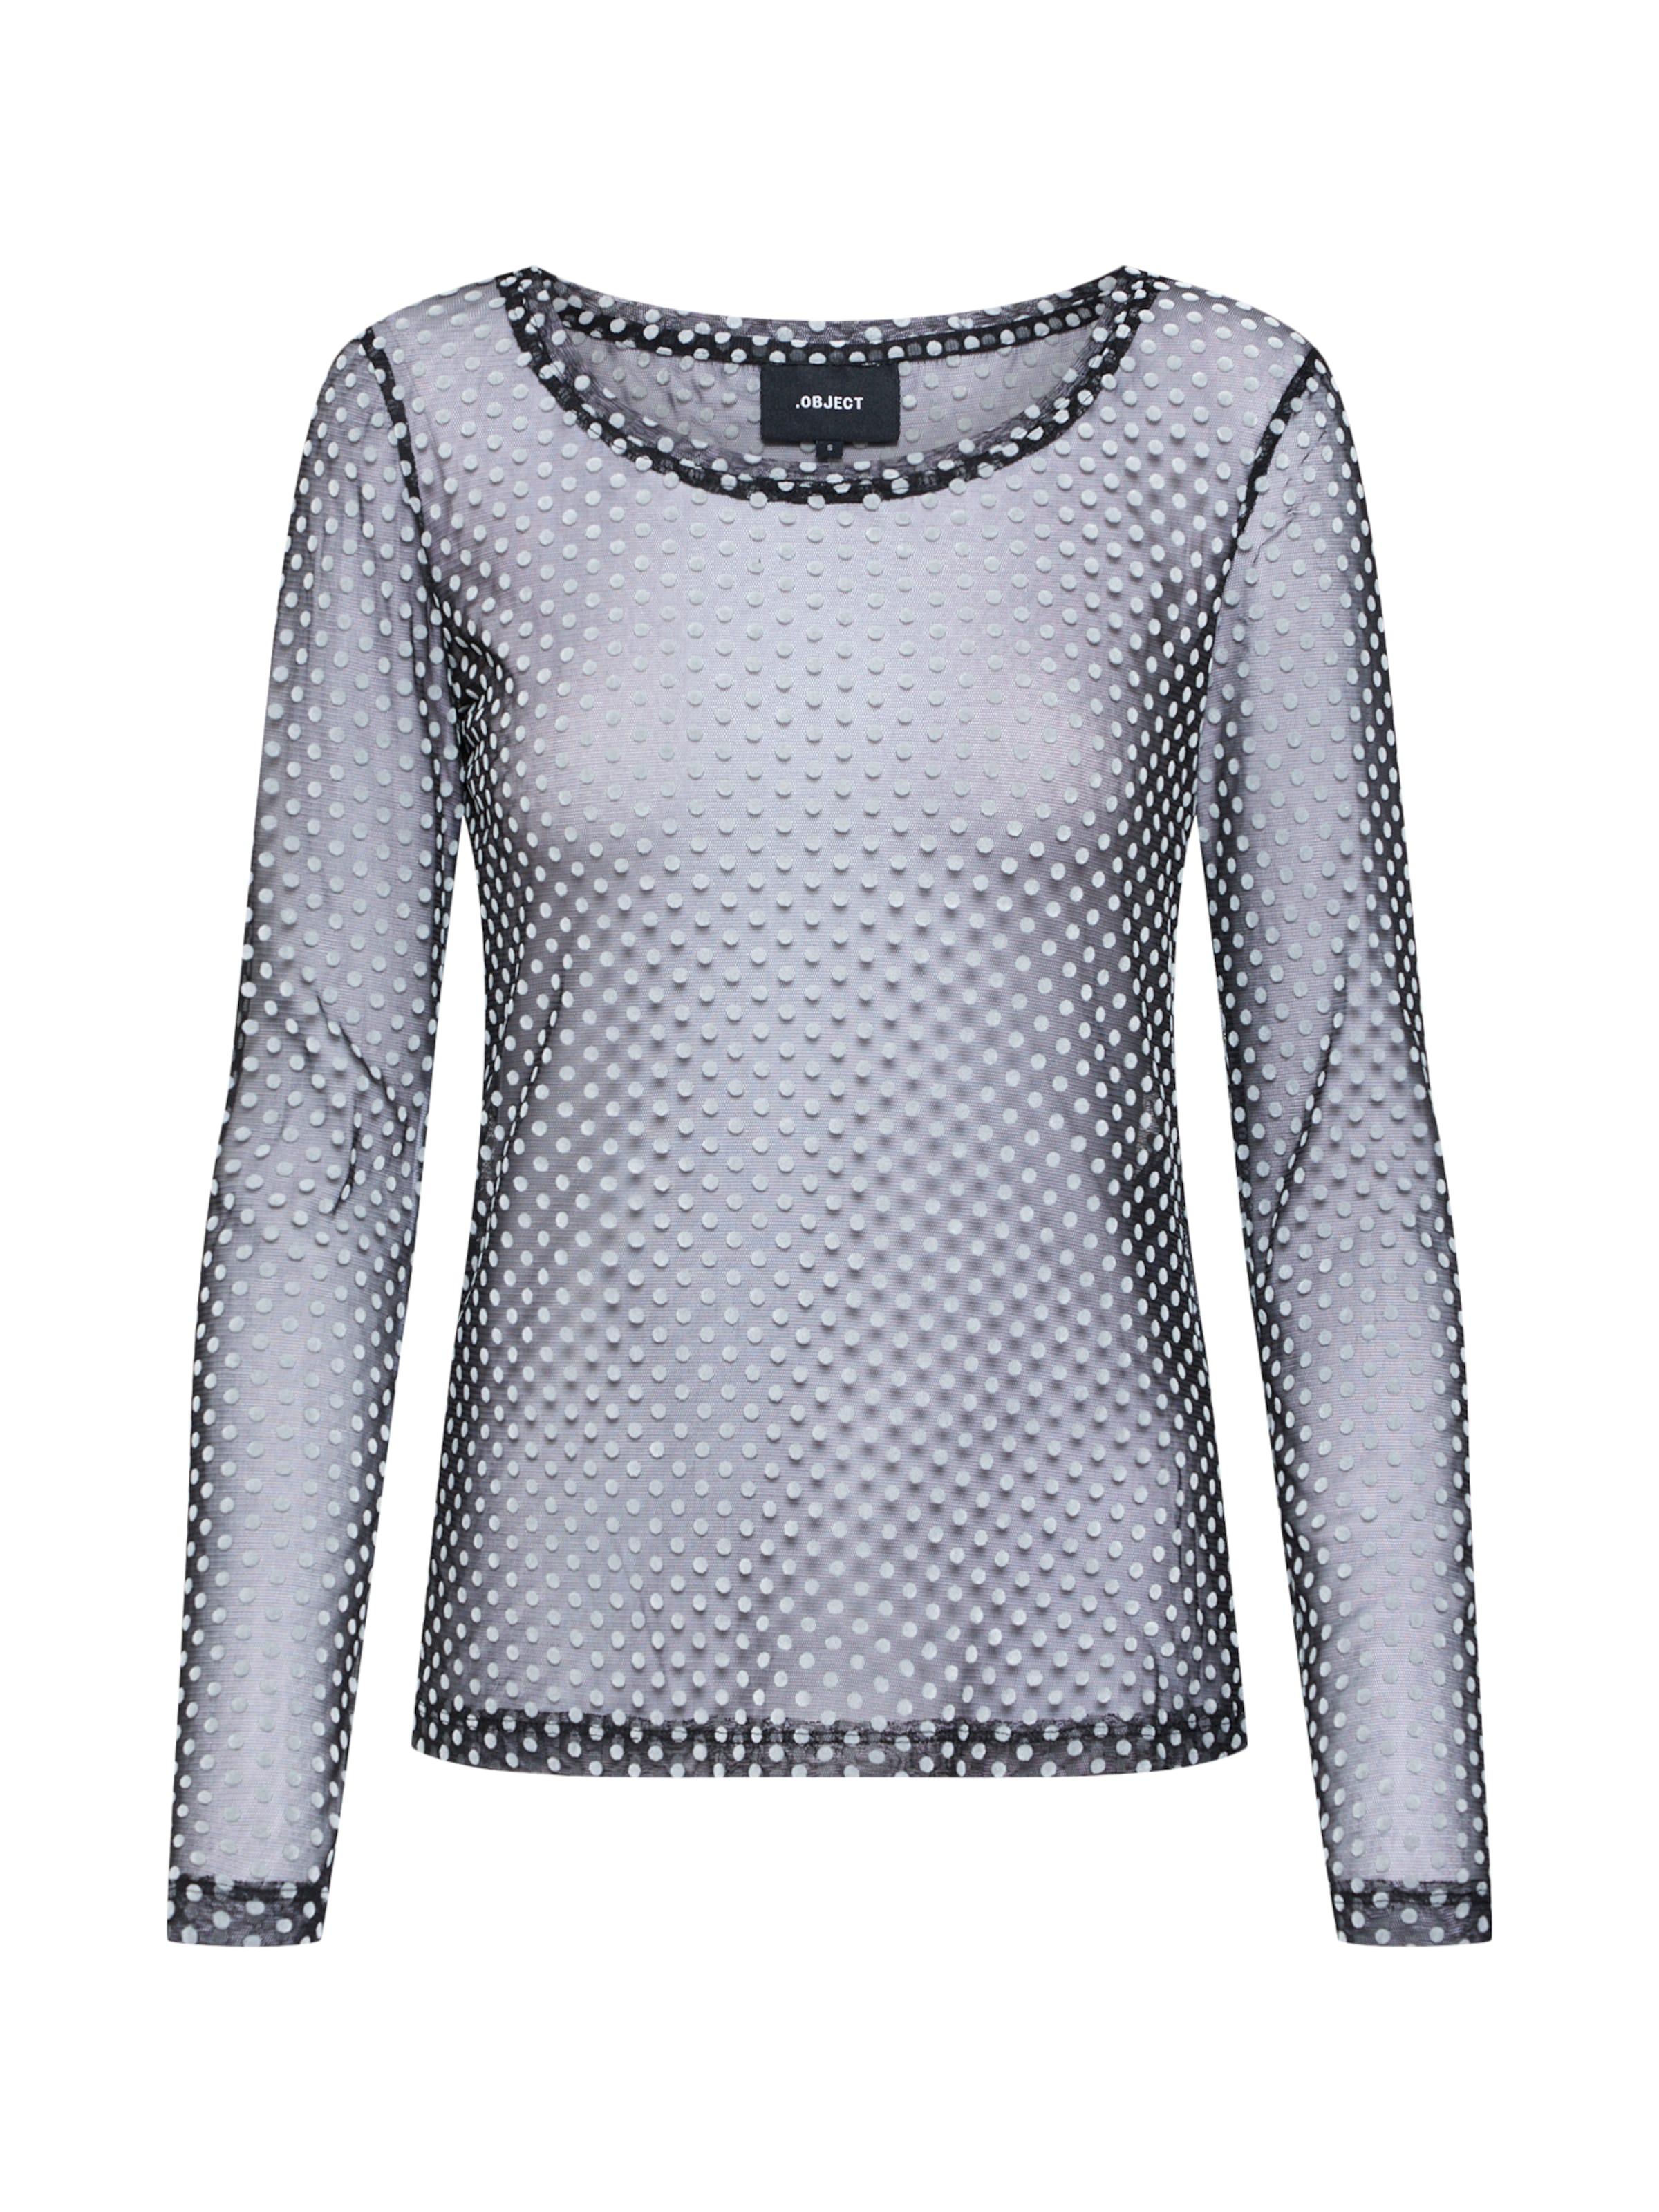 GrisNoir Object En shirt 'louis' T k8NnwZ0PXO